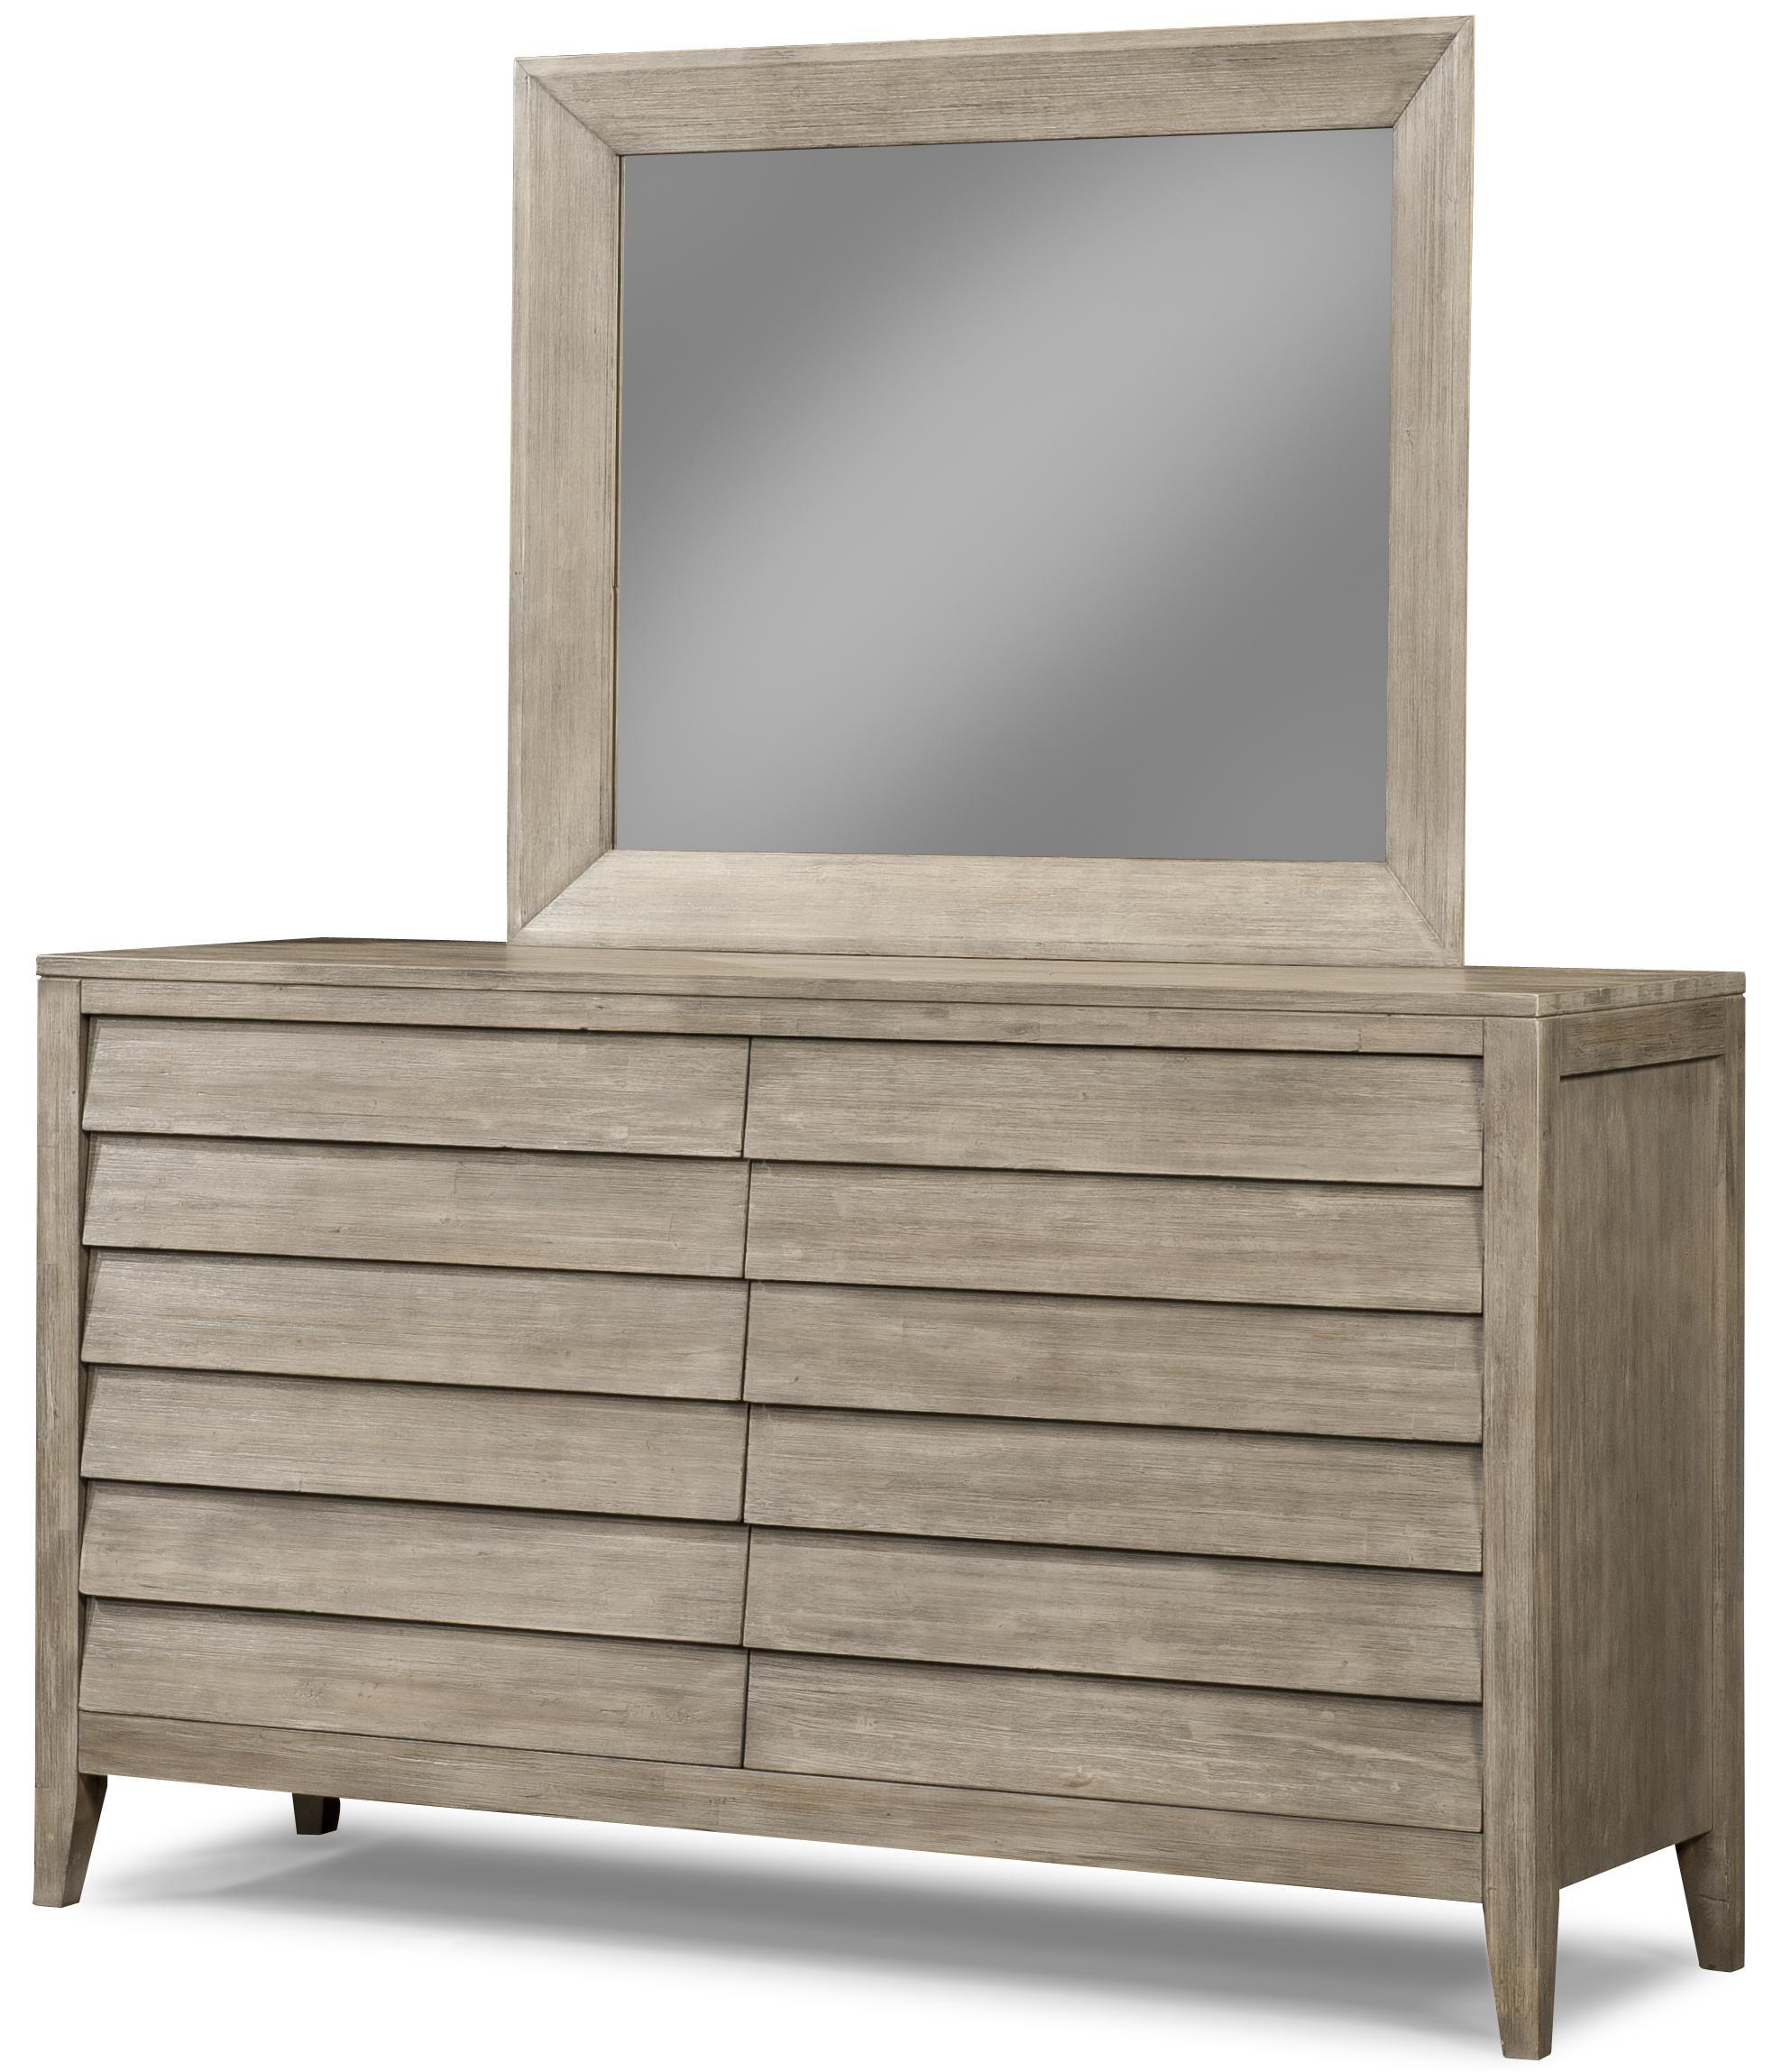 Cresent Fine Furniture Corliss Landing Dresser & Mirror - Item Number: 5601+02